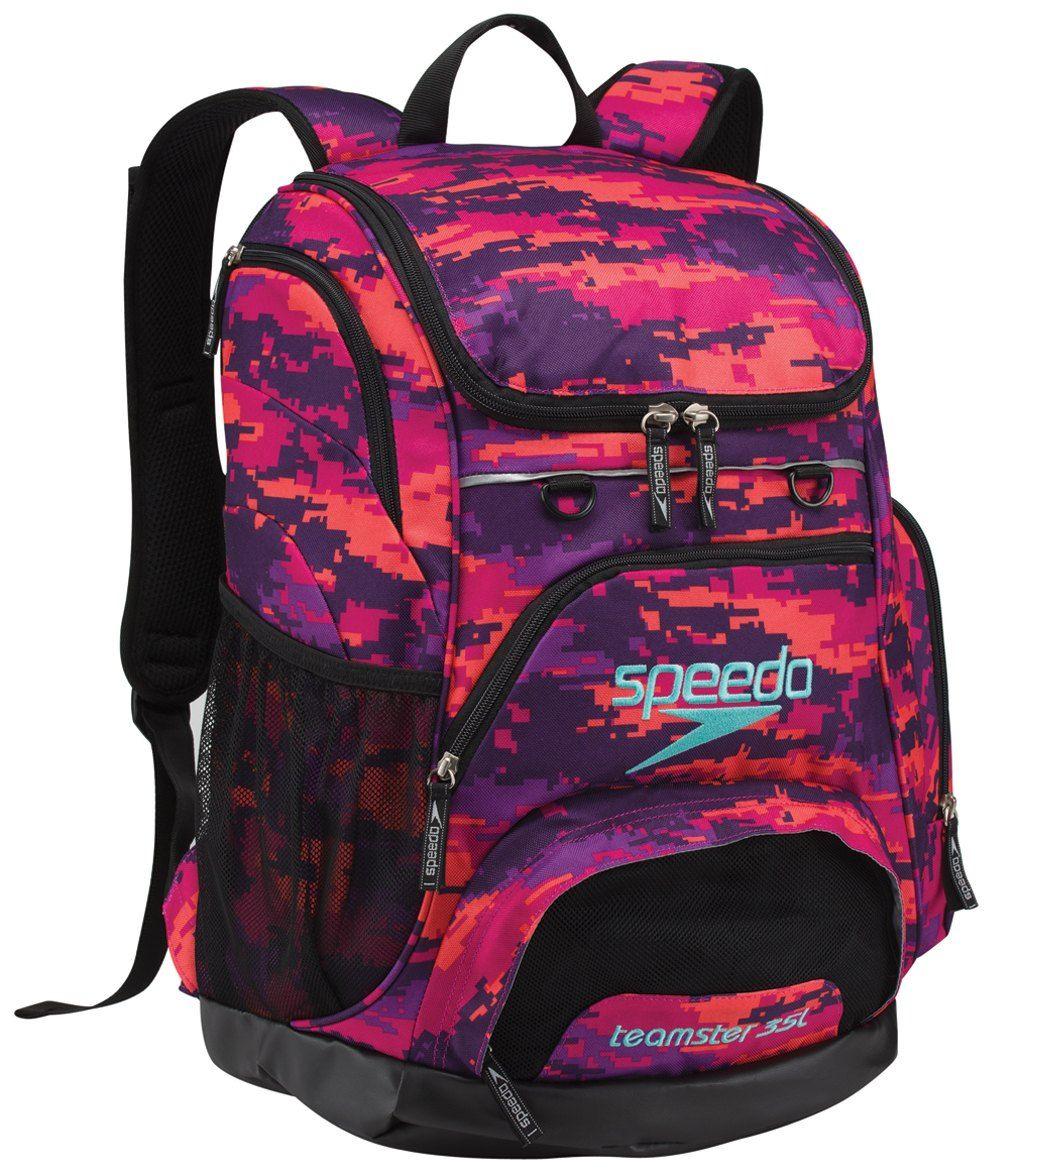 3e00adba43 Speedo Teamster Backpack 25L Team | Swimming❤ | Speedo swimsuits, Swimming  kit, Swimming equipment